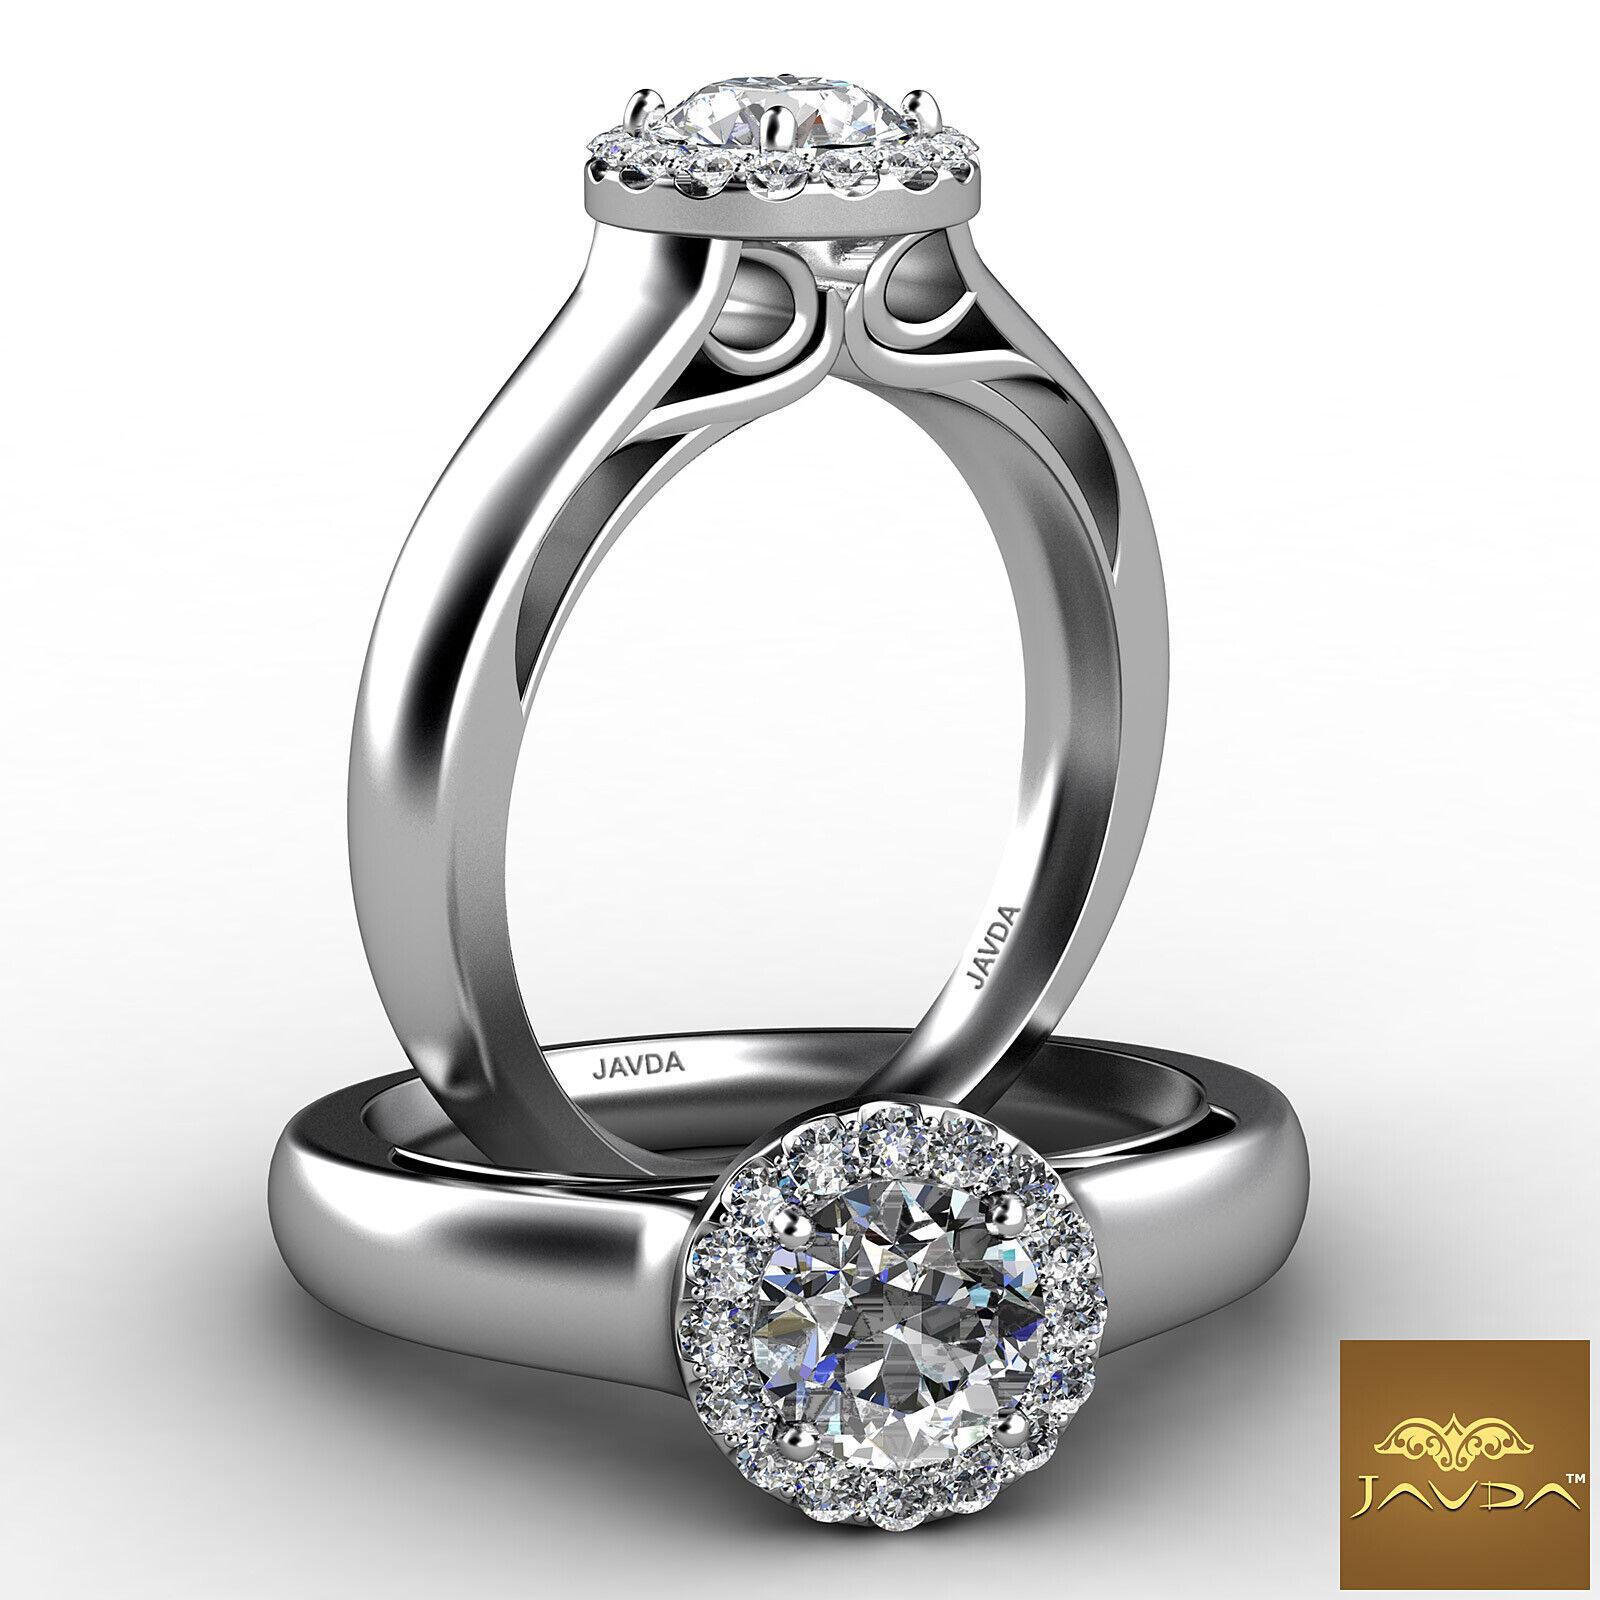 0.7ct Round Natural Diamond Engagement Halo Pave Ring GIA E VVS2 Platinum 950